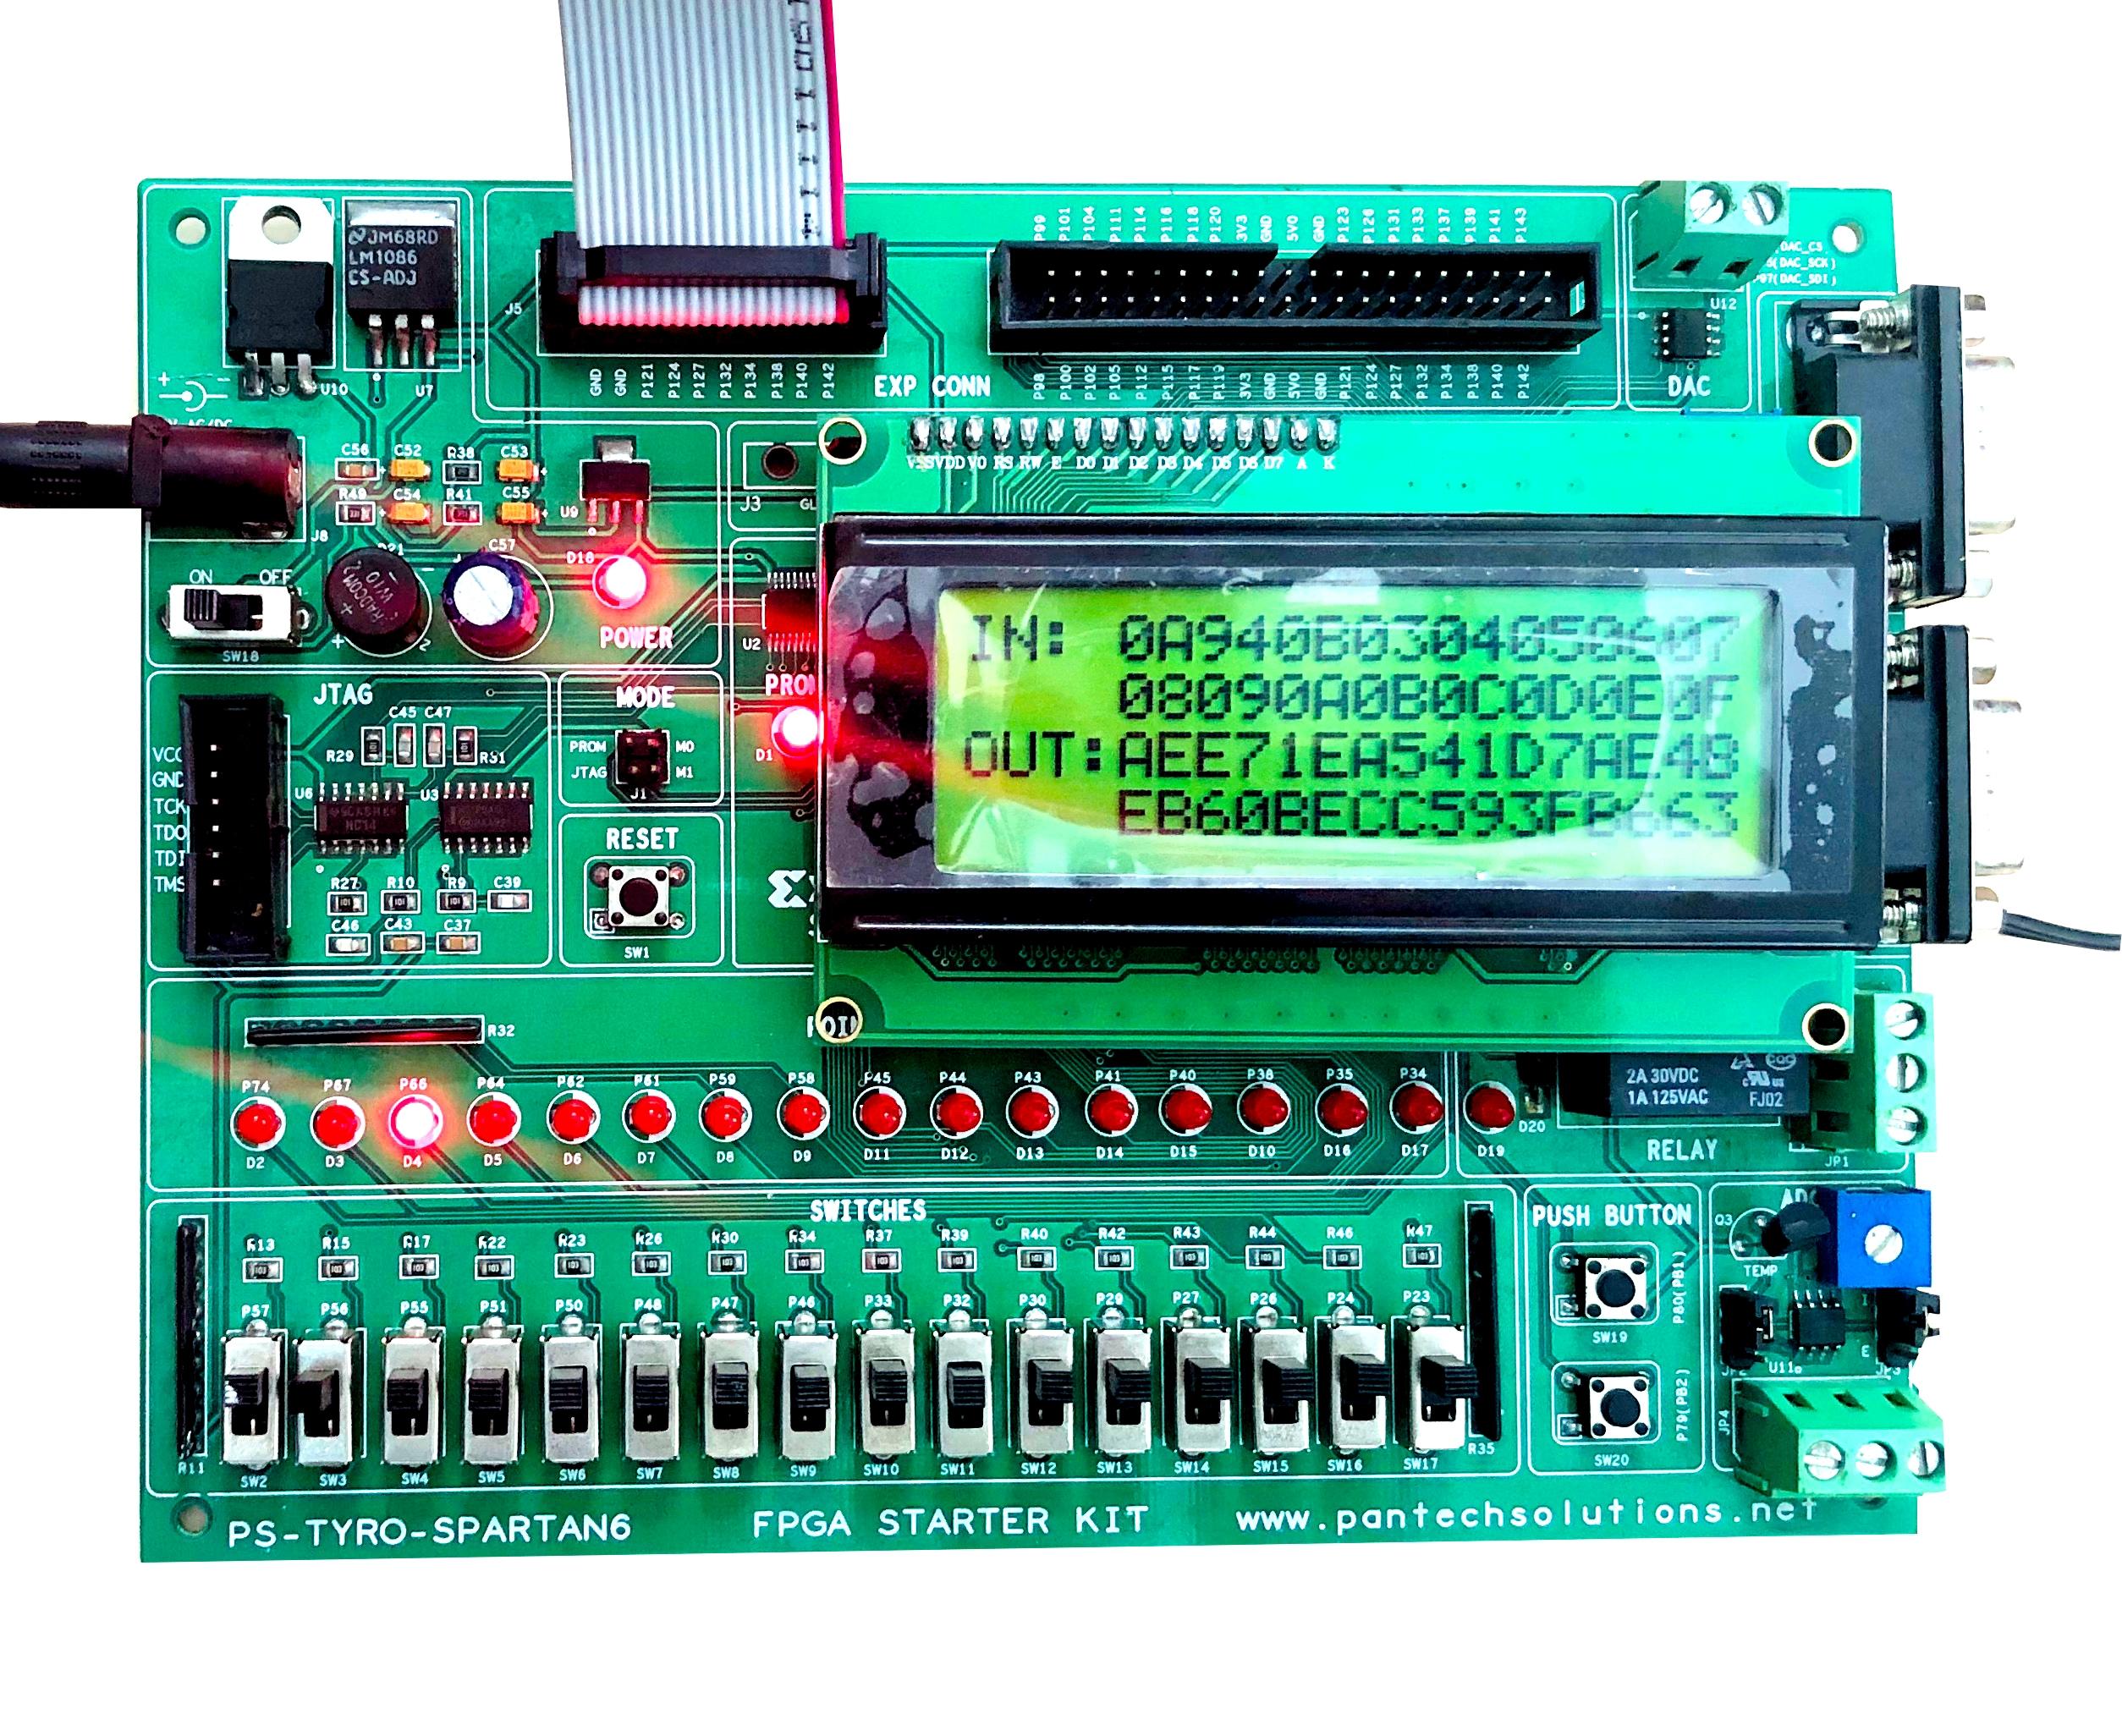 FPGA Implementation of AES Algorithm using Spartan6 FPGA Project Kit